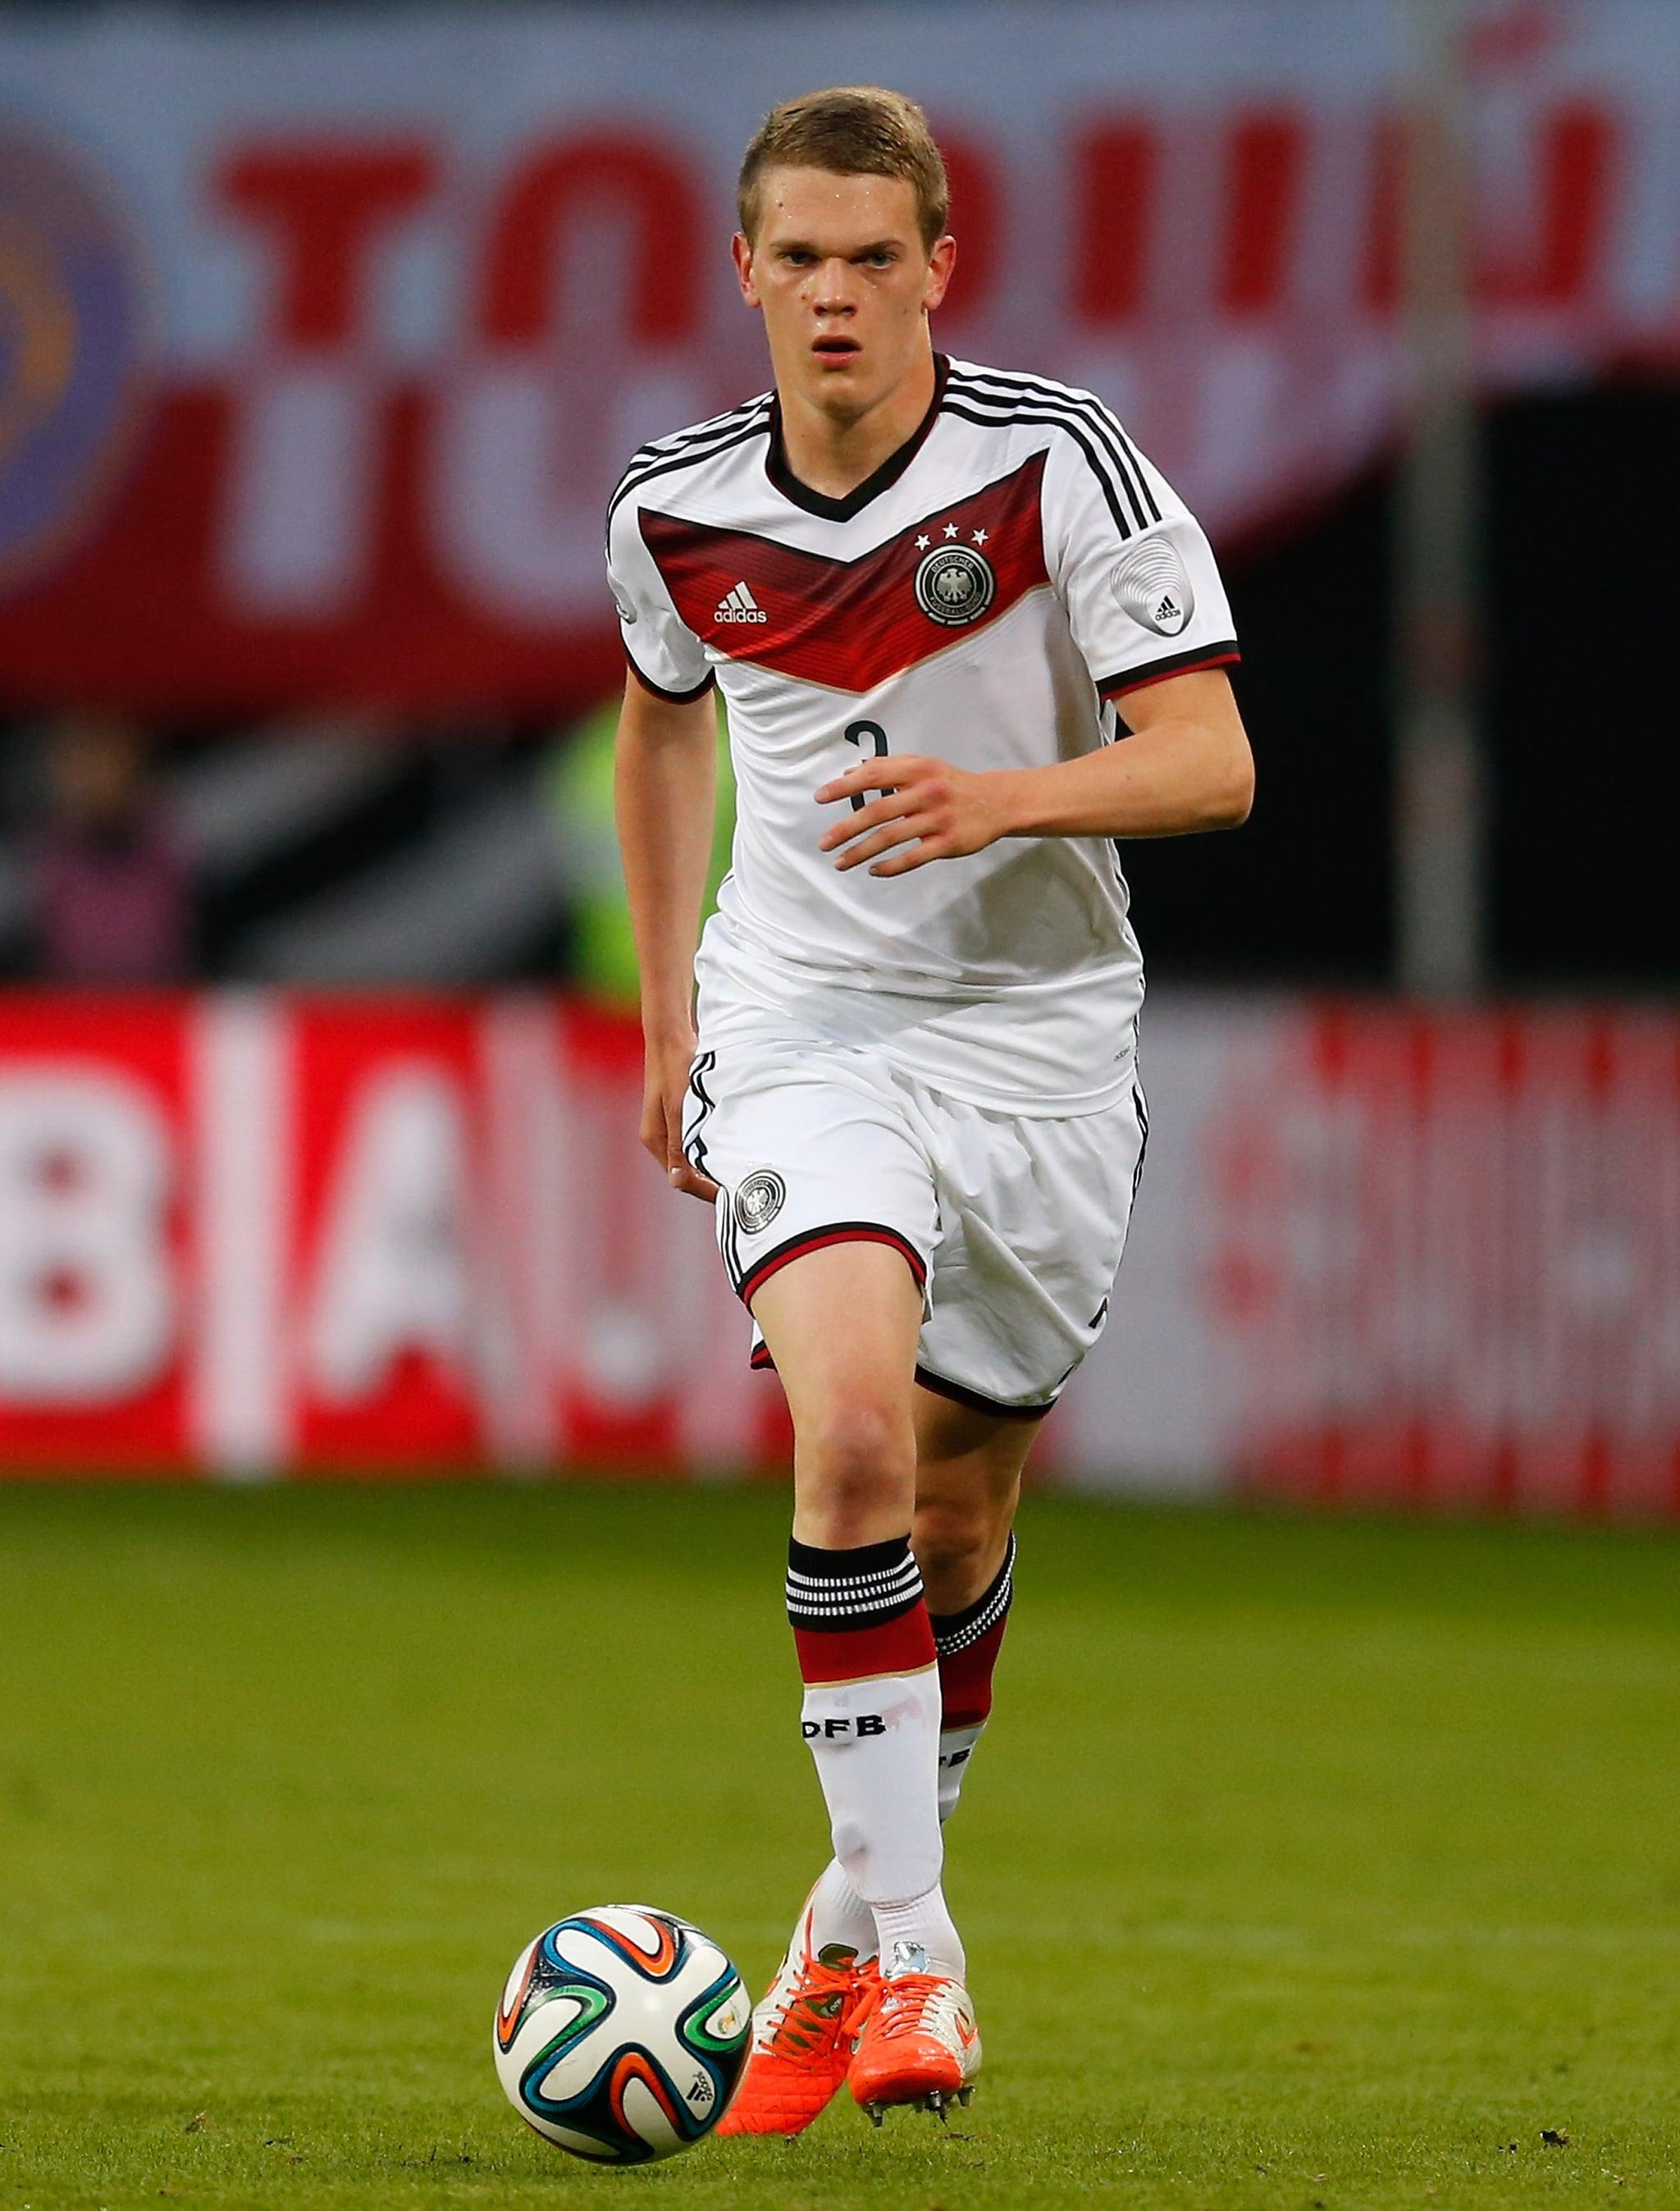 Germany: Matthias Ginter